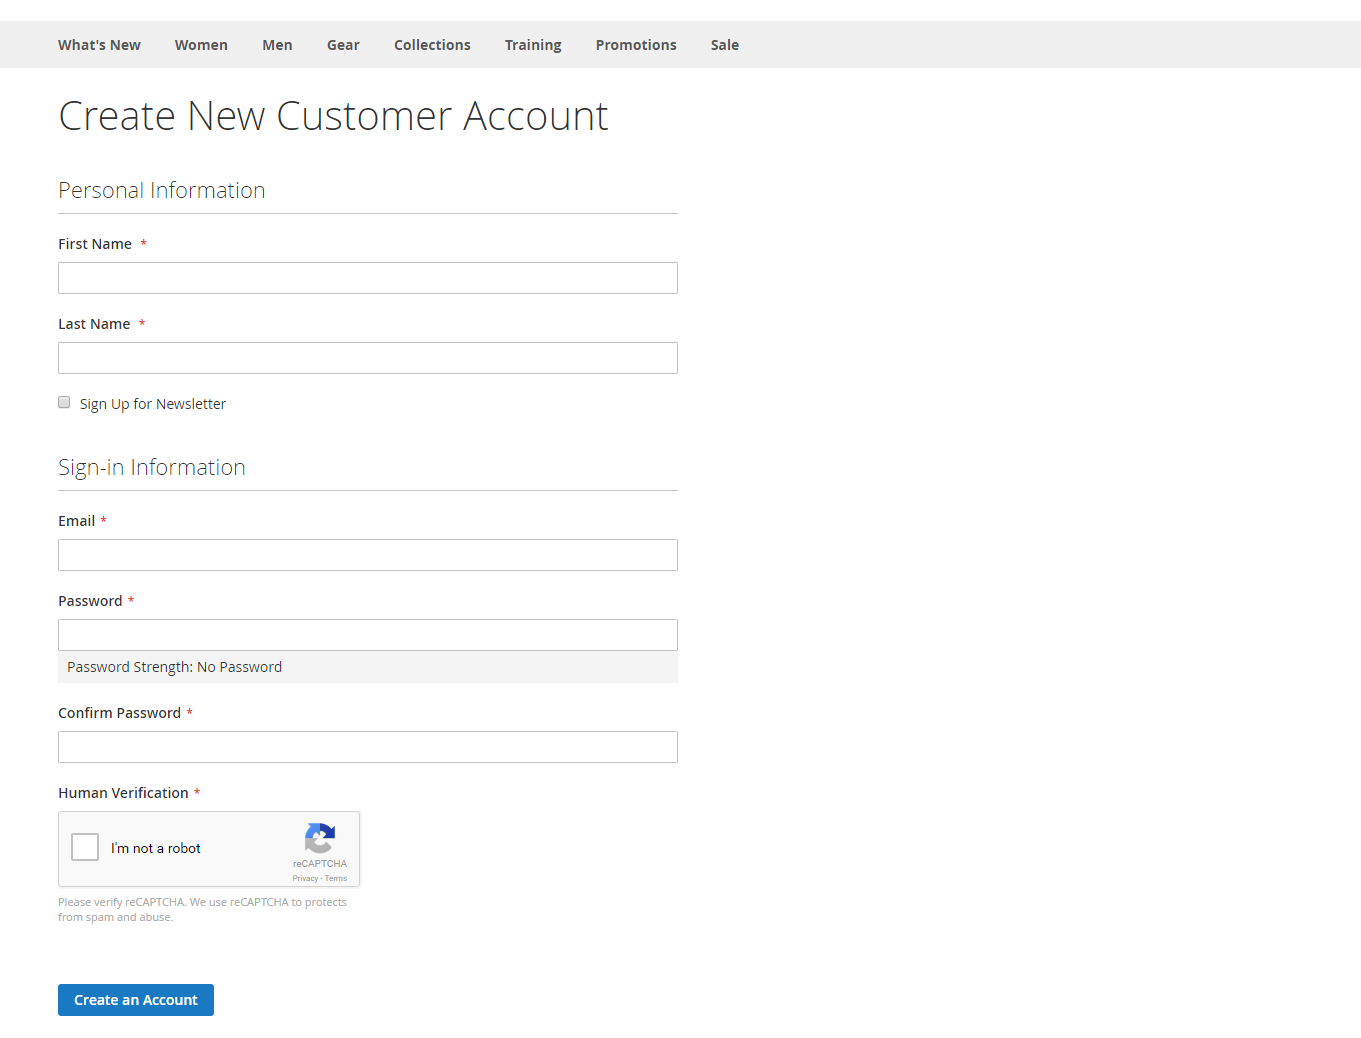 reCAPTCHA v2 in customer create form